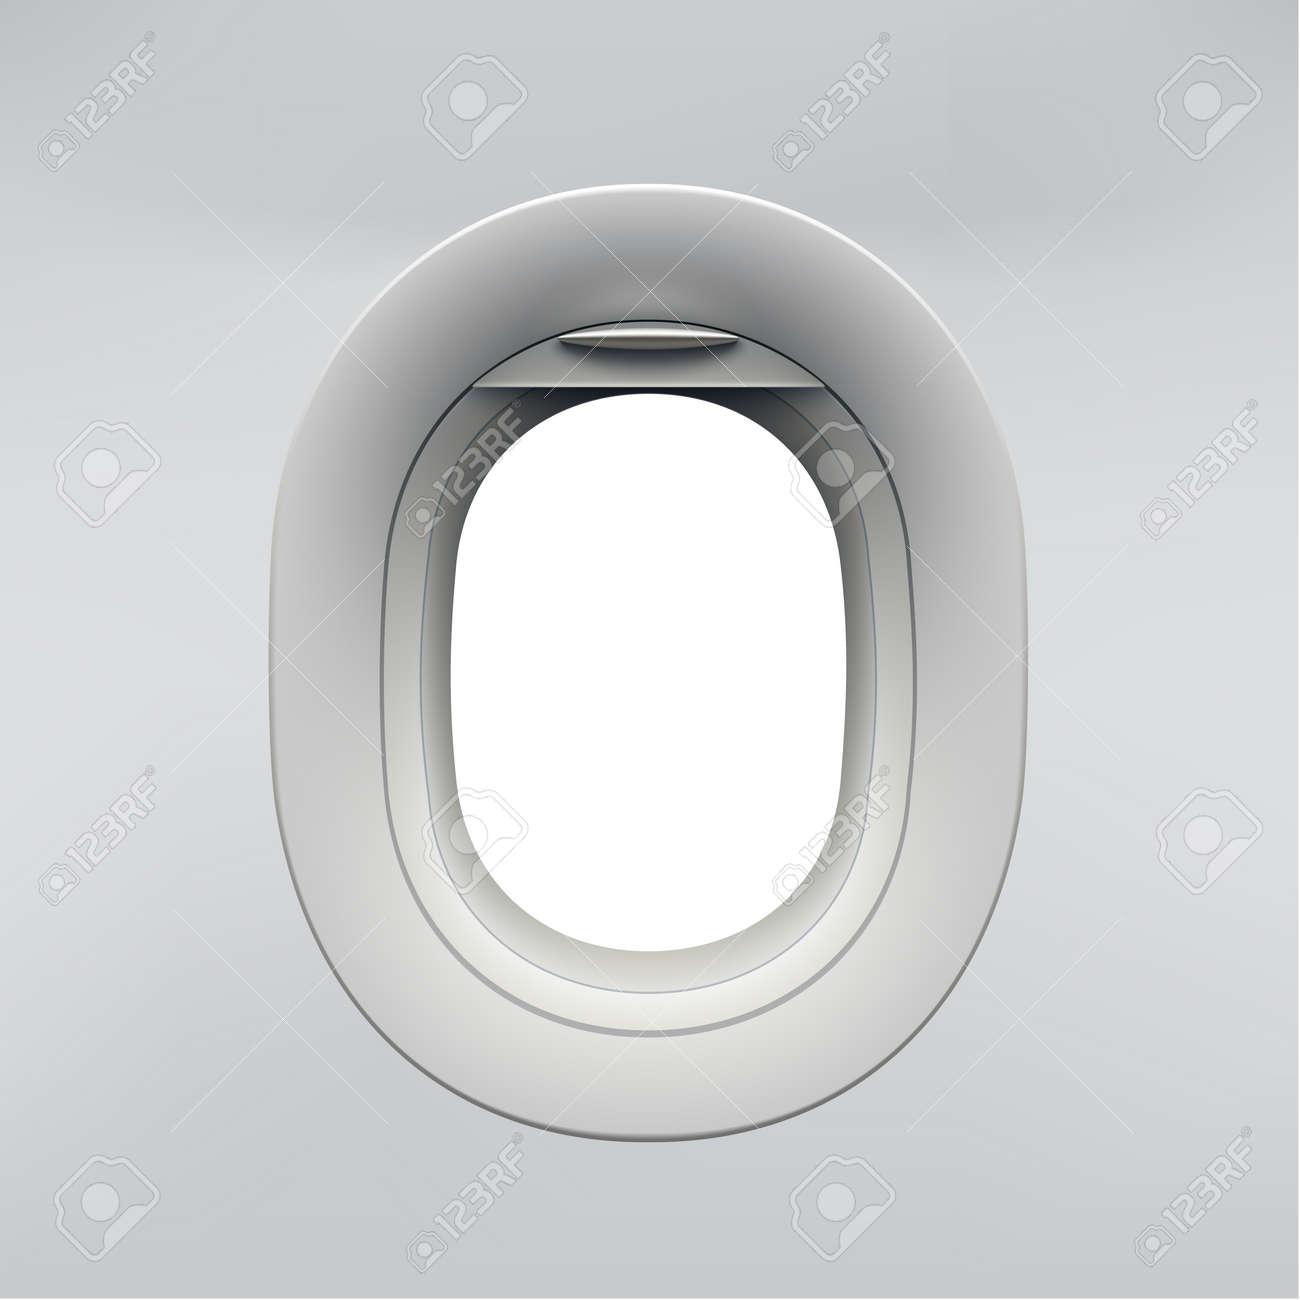 Vector realistic airplane window, aircraft illuminator. - 97946999